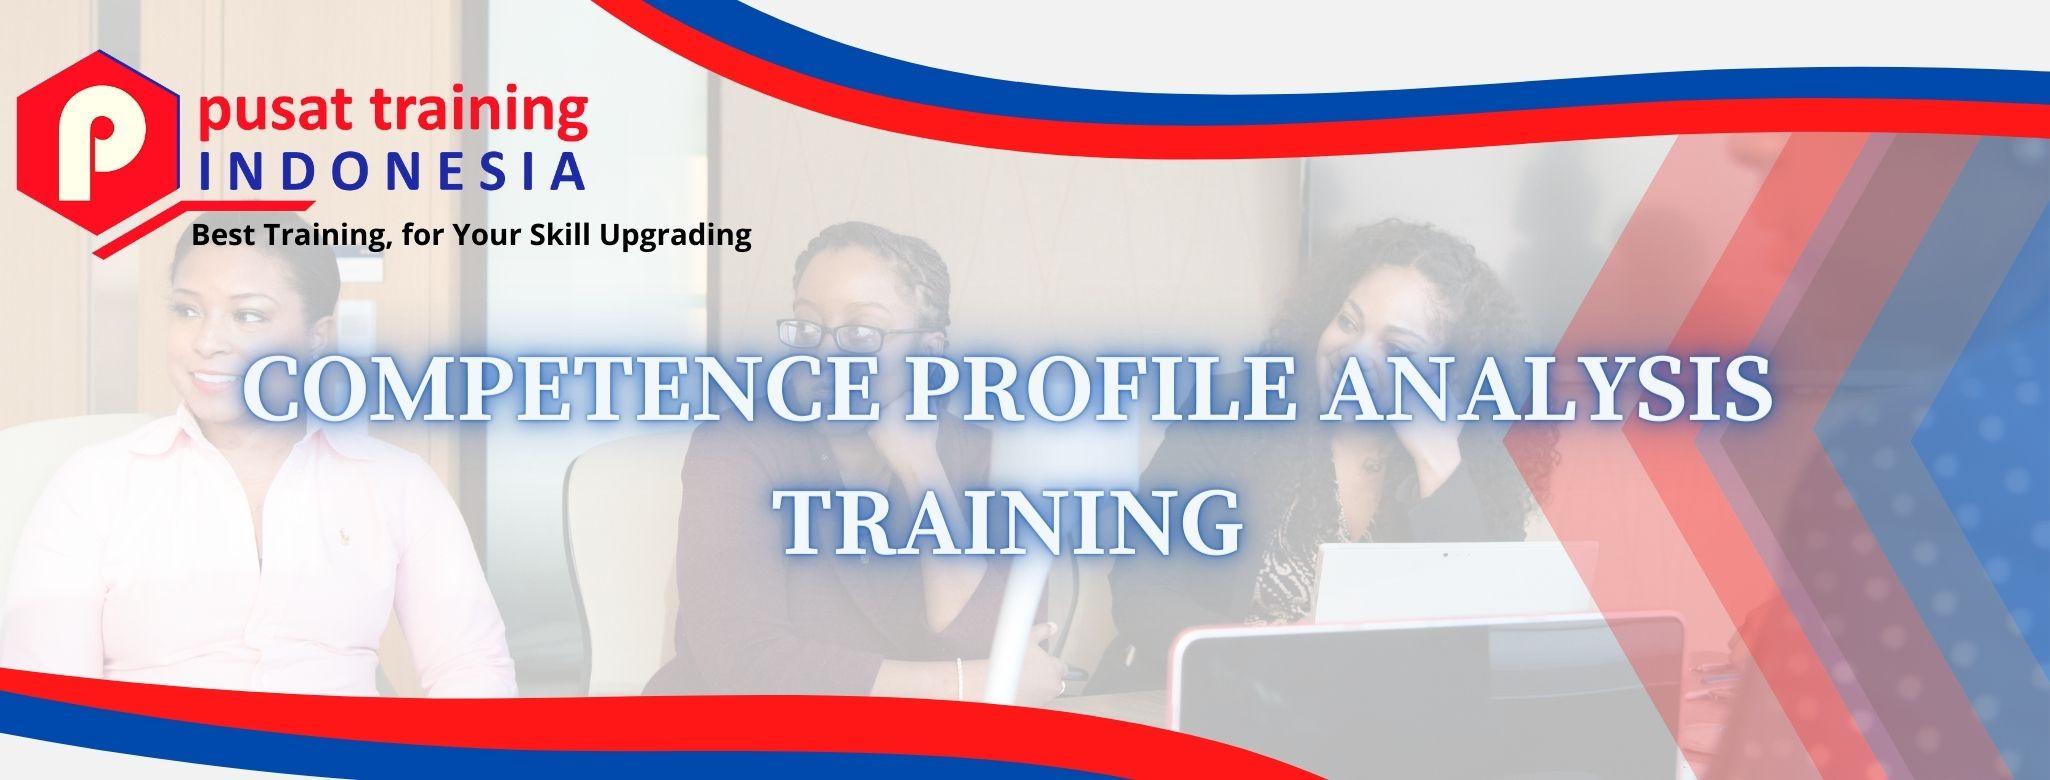 competence-profile-analysis-training-2